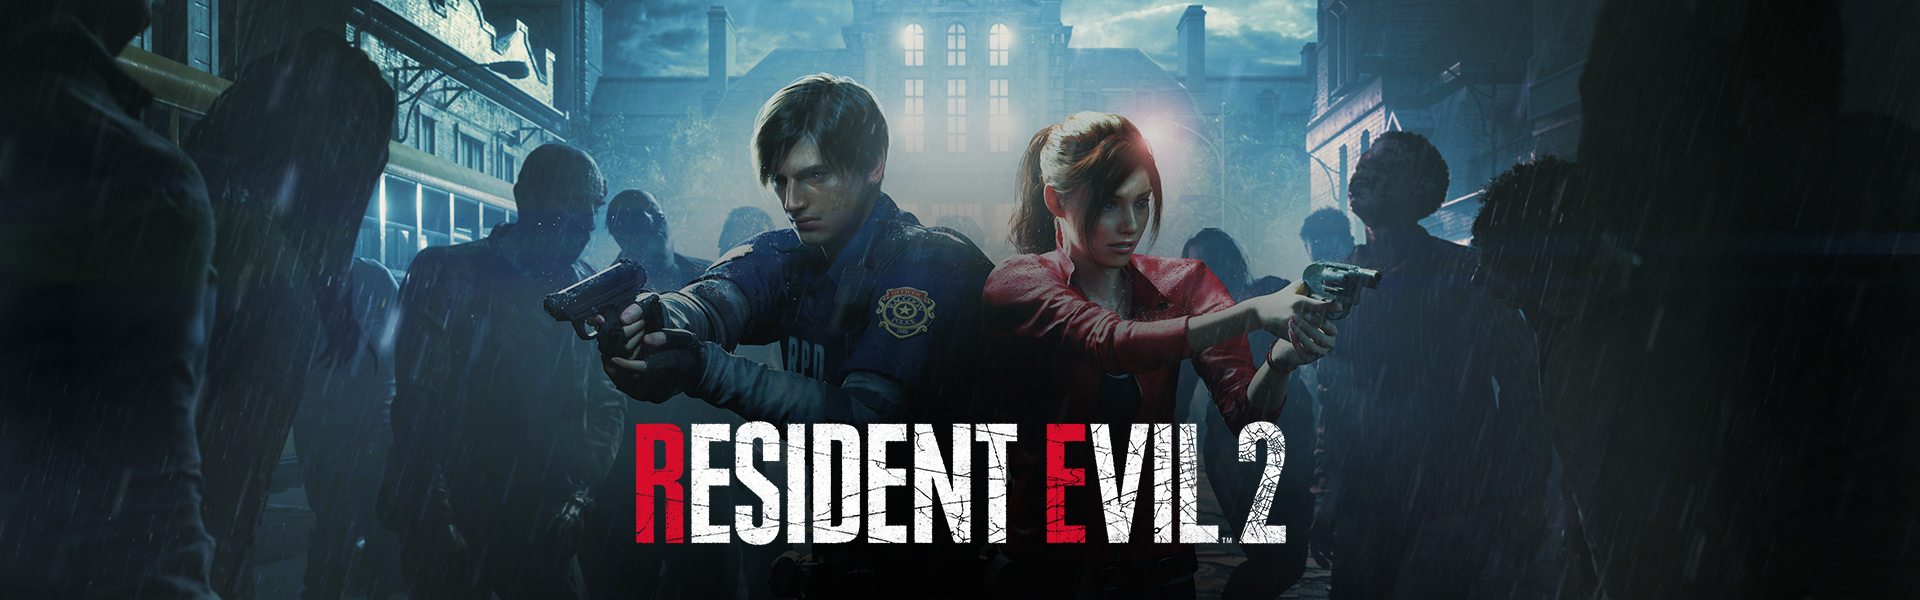 Sortie jeux janvier 2019 resident evil 2